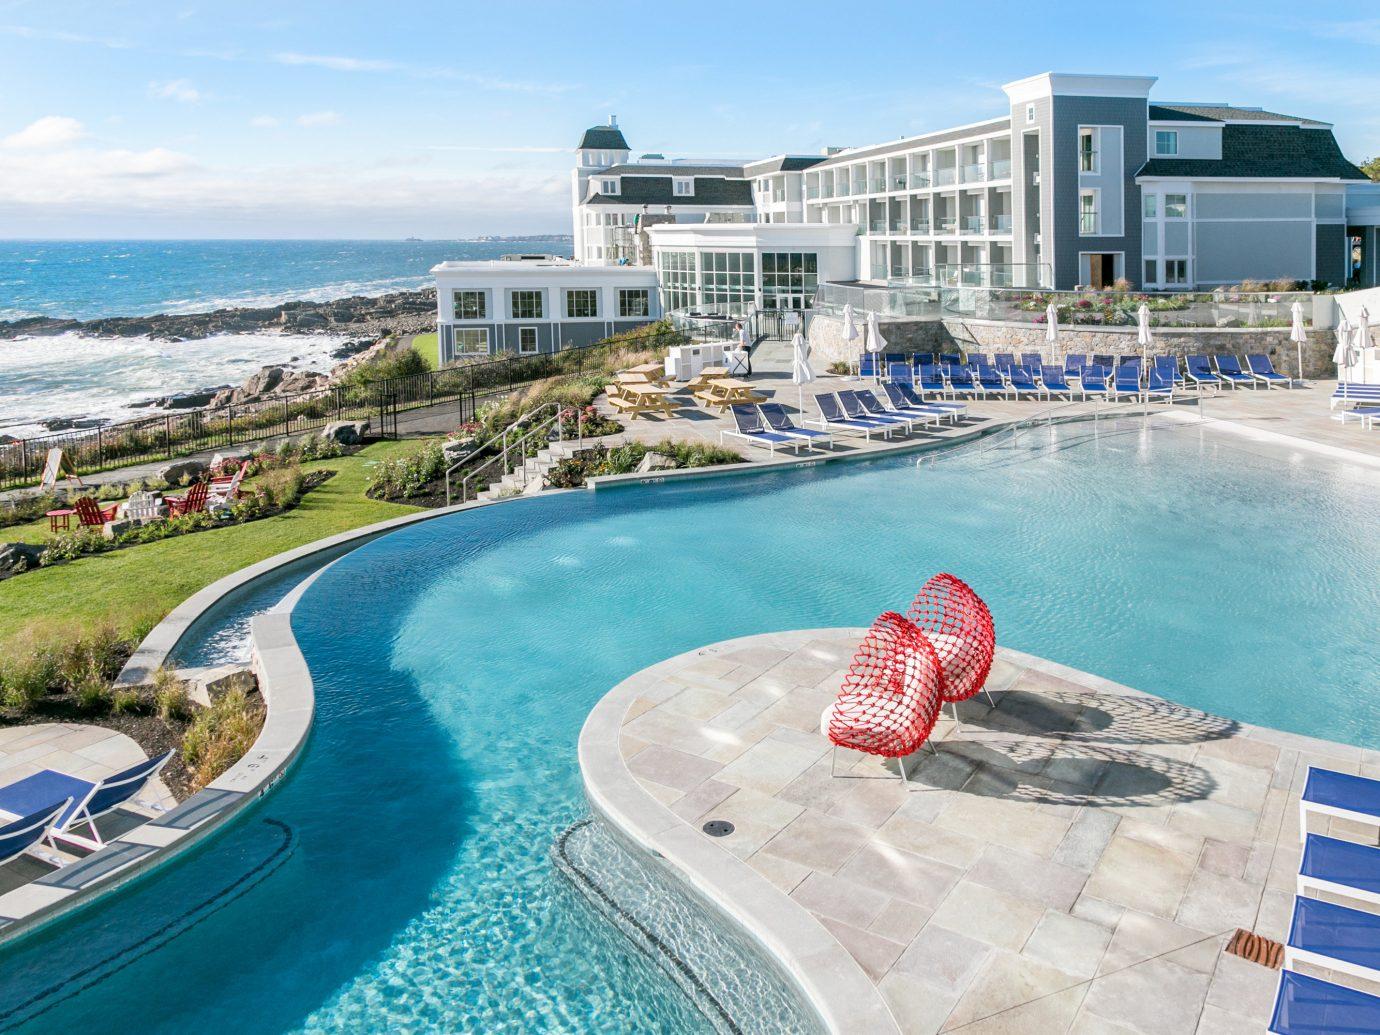 Hotels sky outdoor water leisure swimming pool vacation Sea Resort Pool Ocean estate marina Coast Beach Water park dock caribbean bay walkway shore